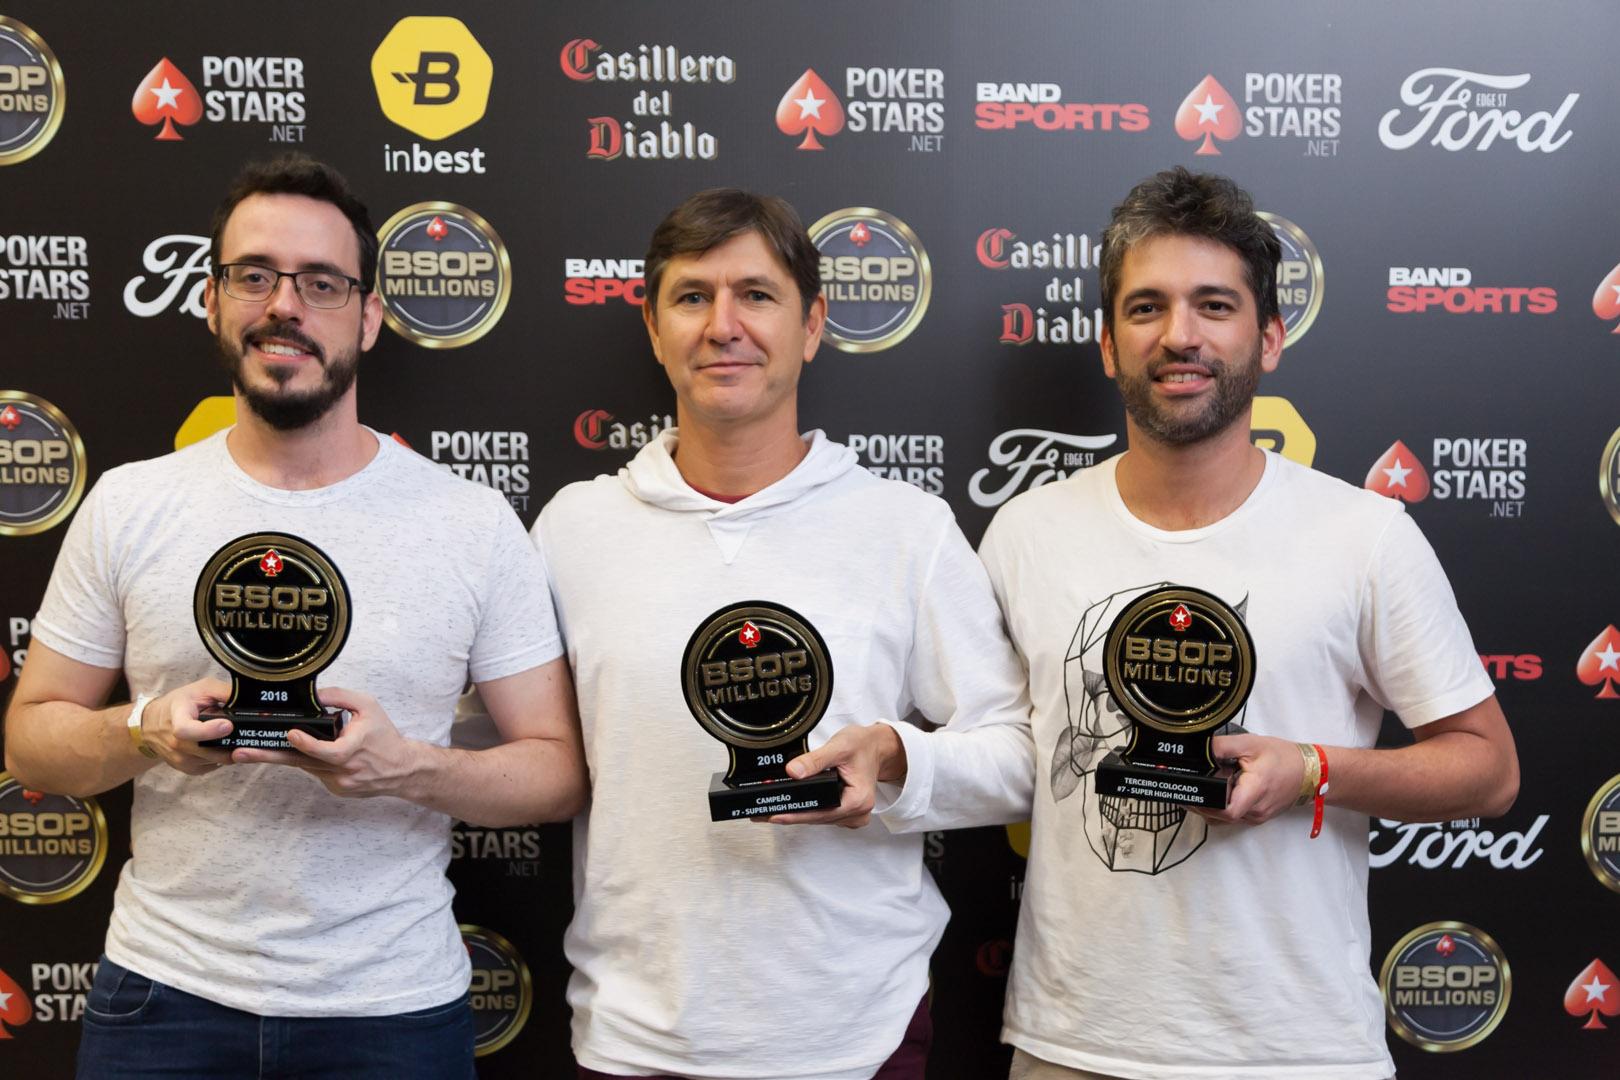 Cássio Kiles, Francisco Neto e Ricardo Lima - Super High Rollers - BSOP Millions